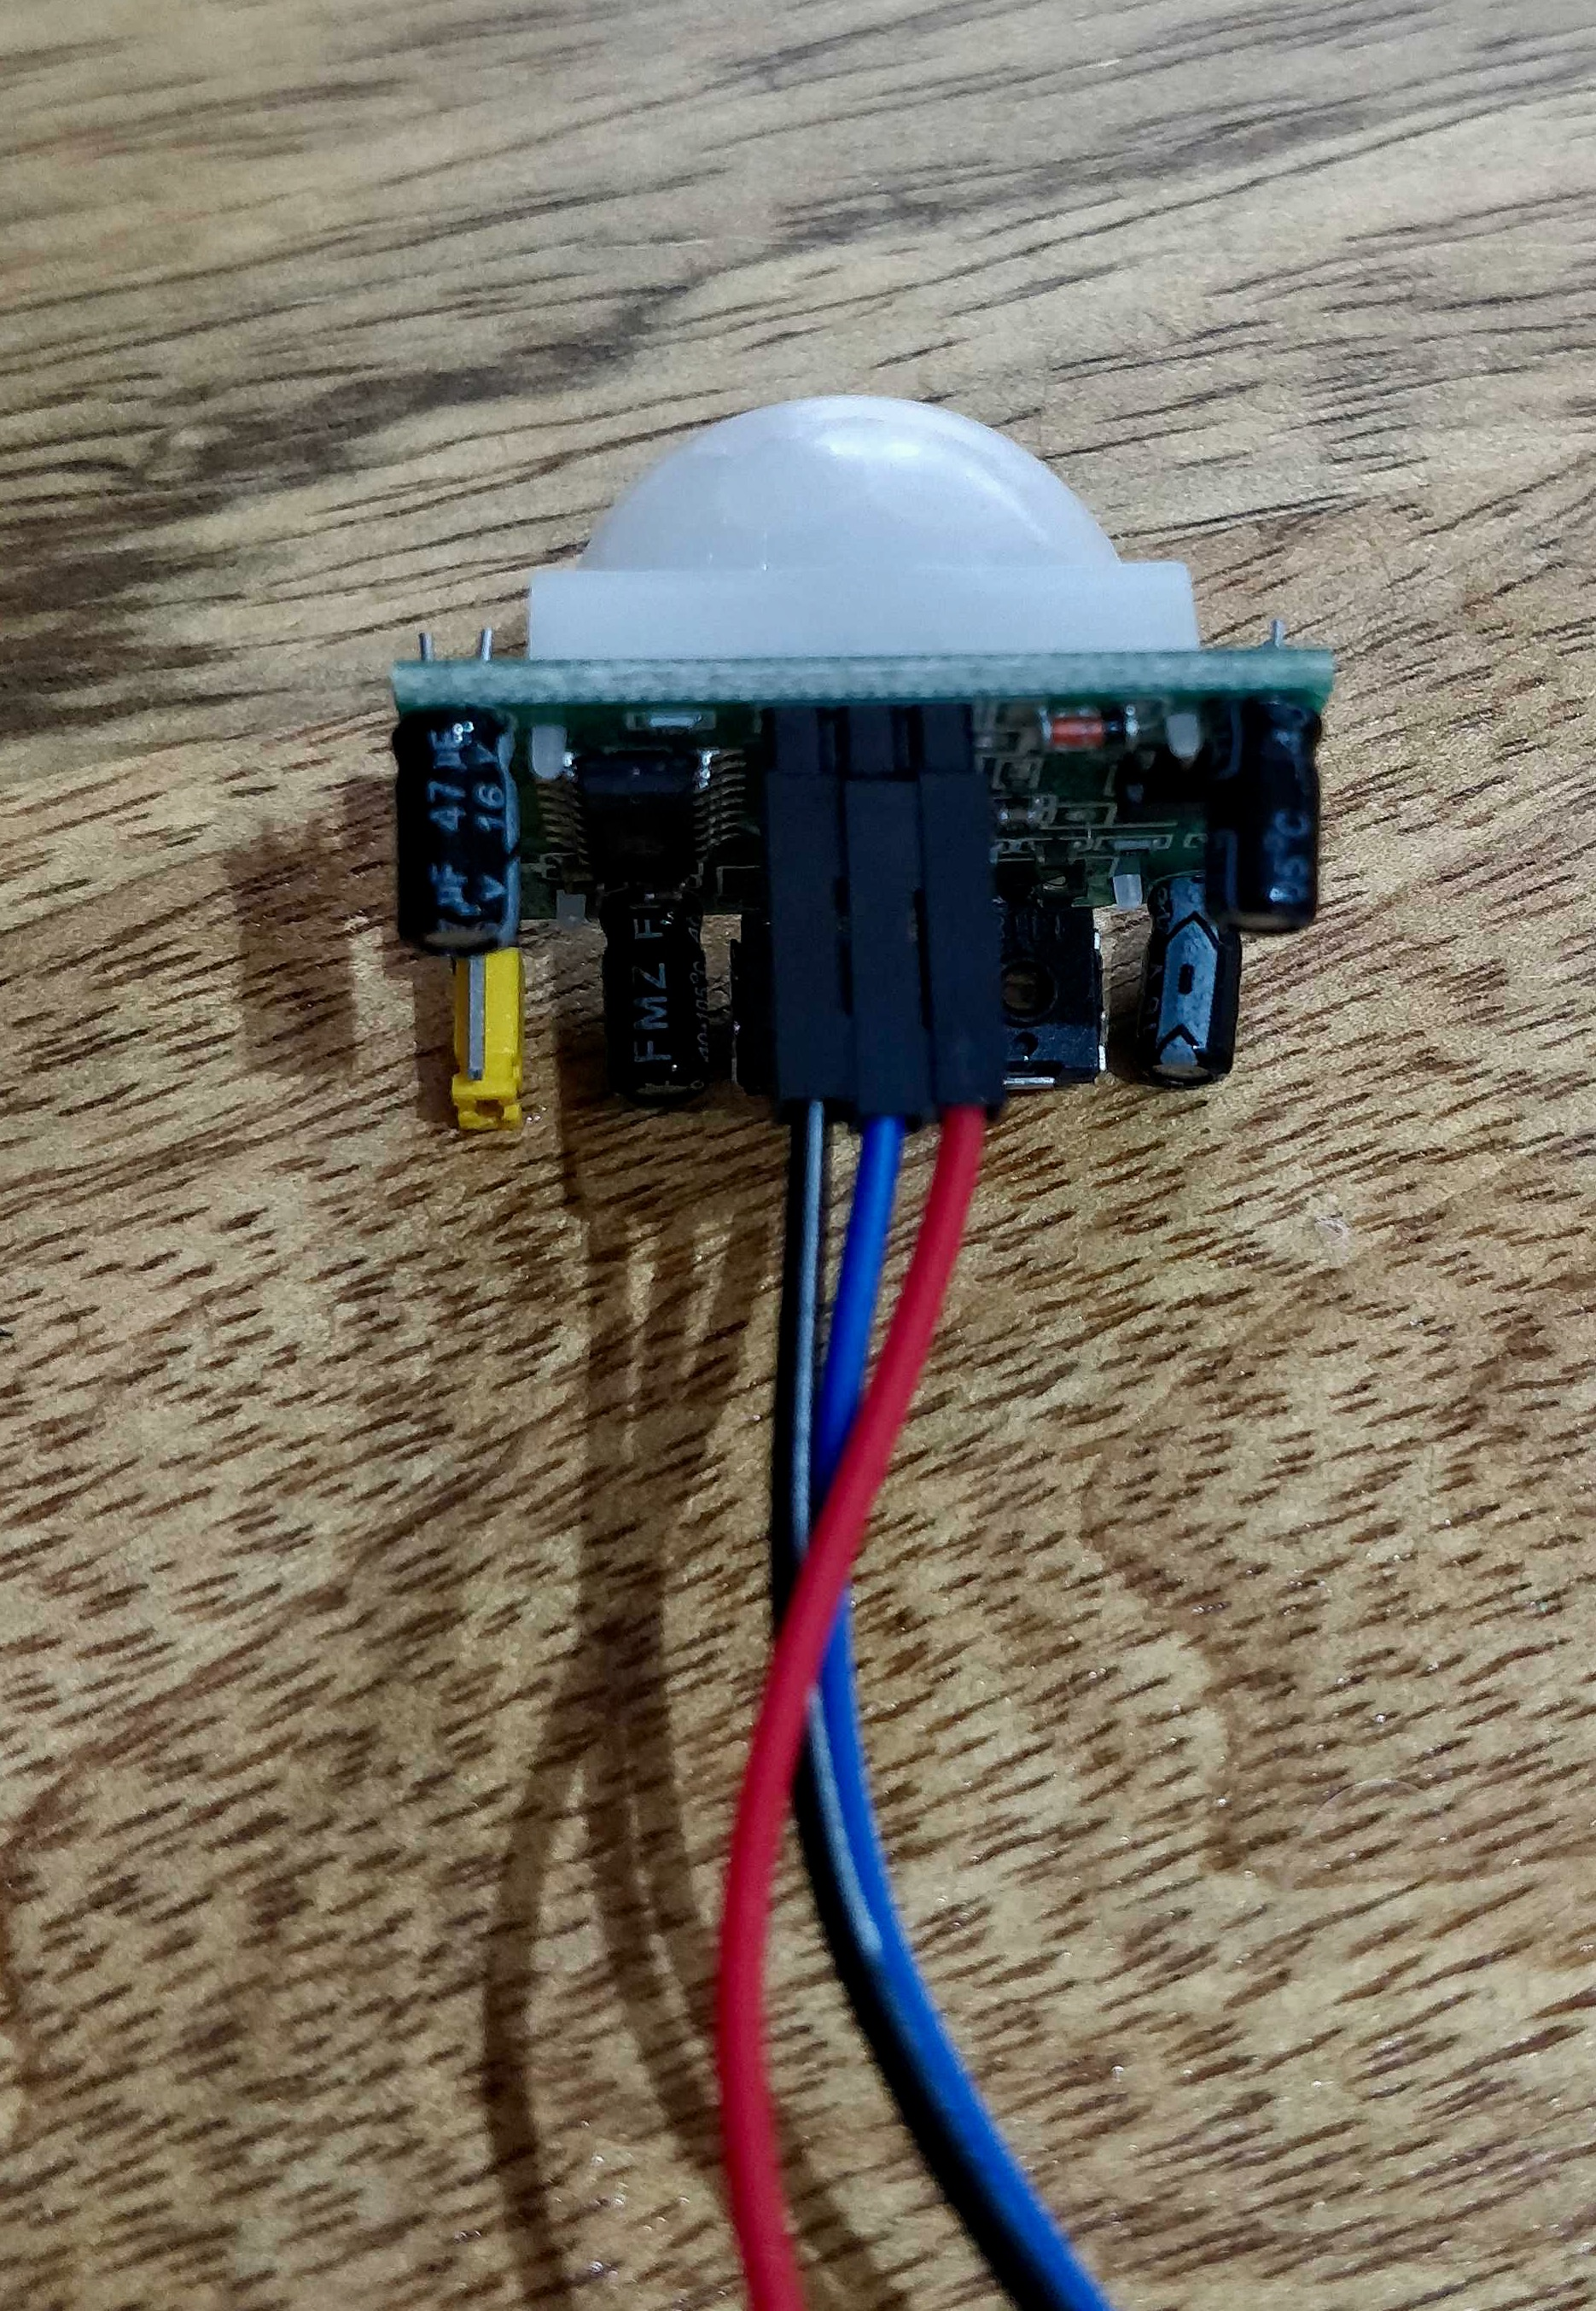 Wiring Sensor to Raspberry Pi Pt1